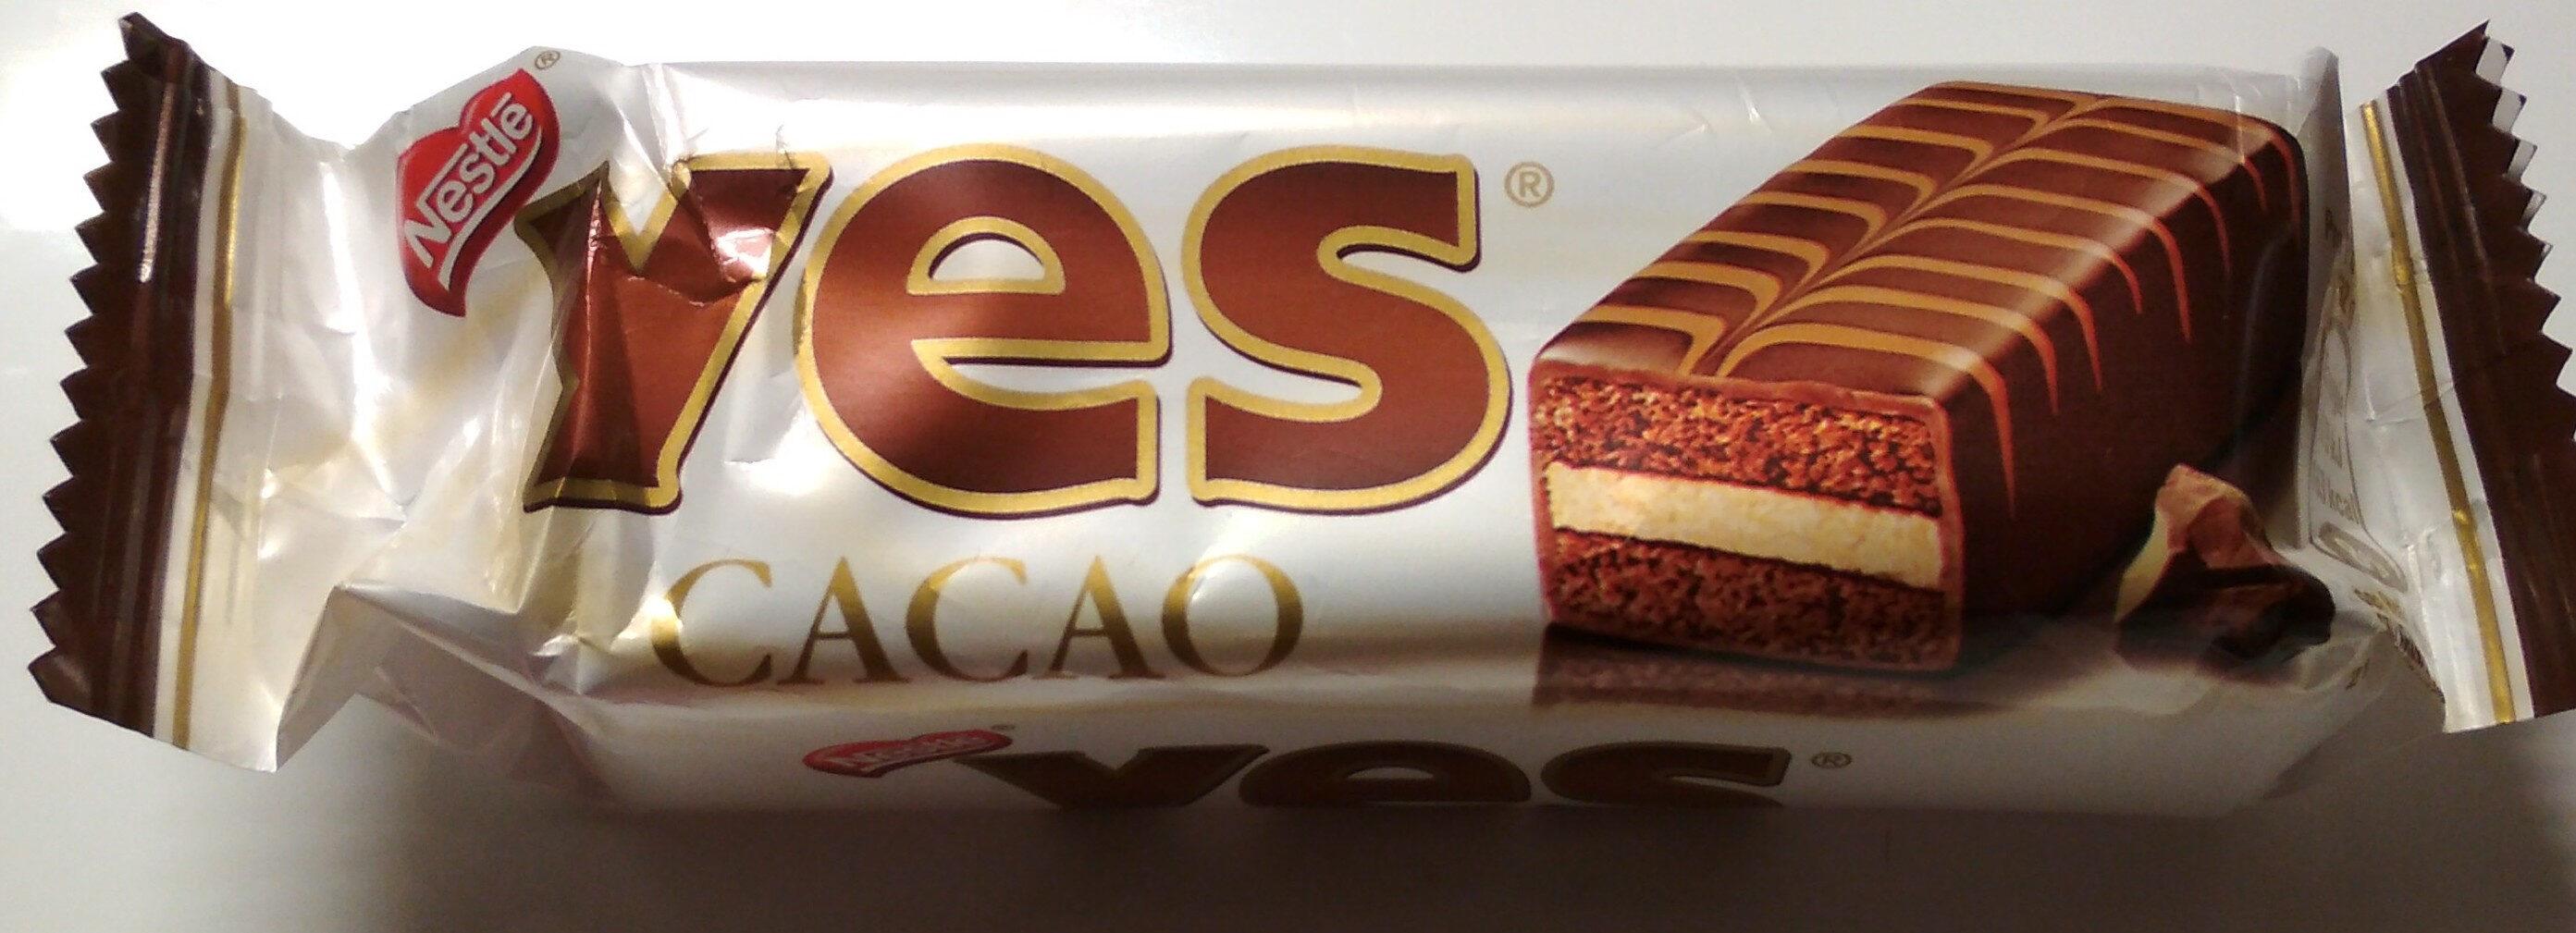 Yes Cacao - Produkt - de